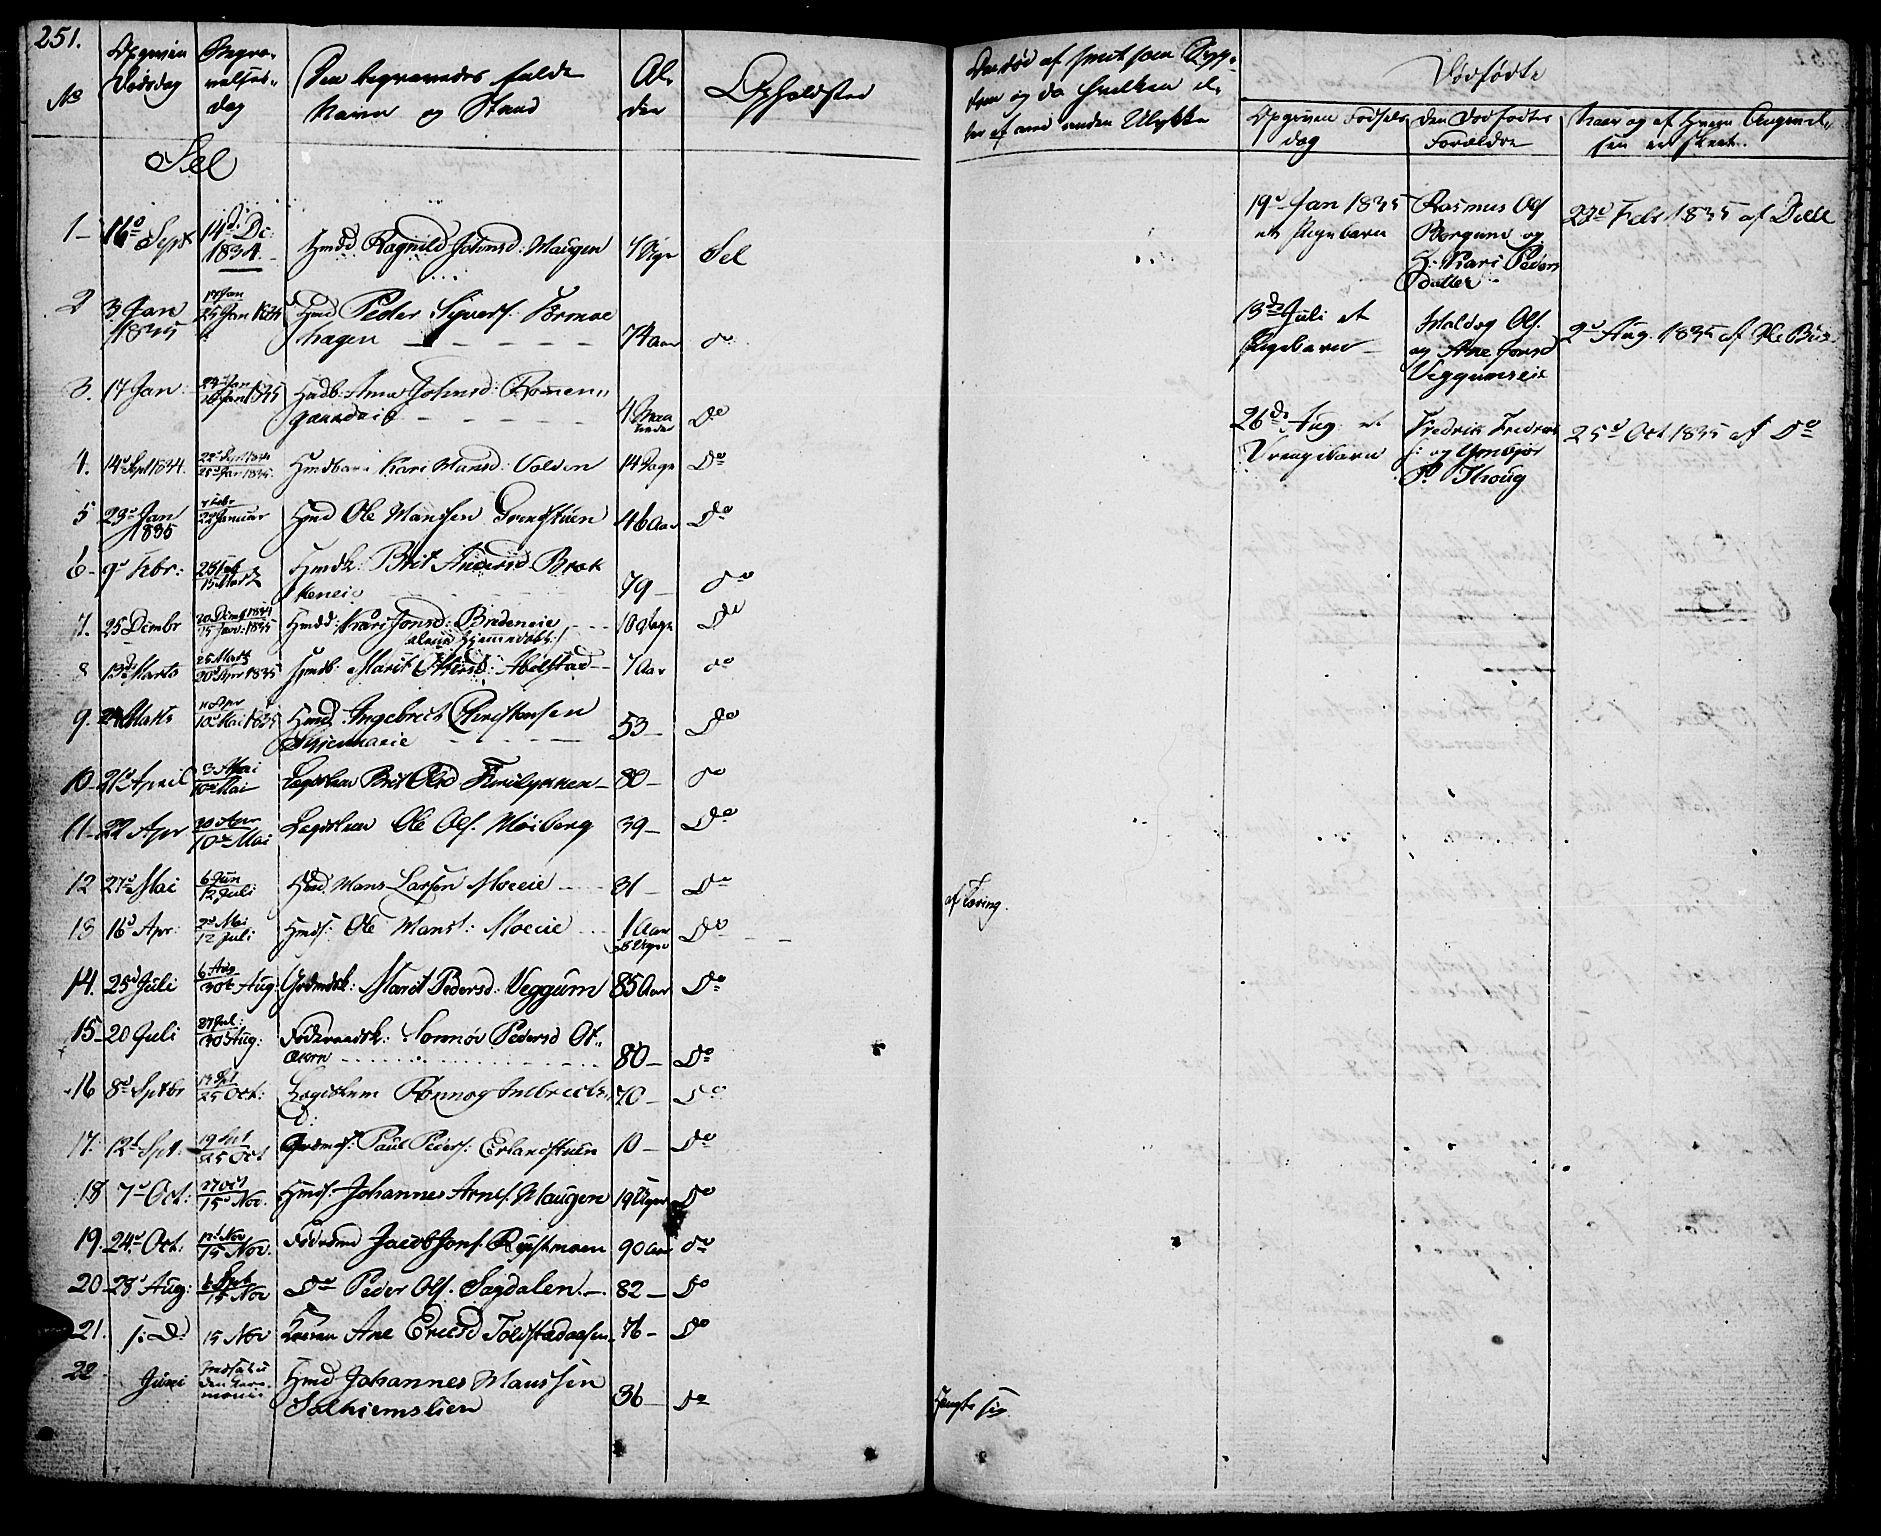 SAH, Vågå prestekontor, Ministerialbok nr. 4 /3, 1834-1842, s. 251